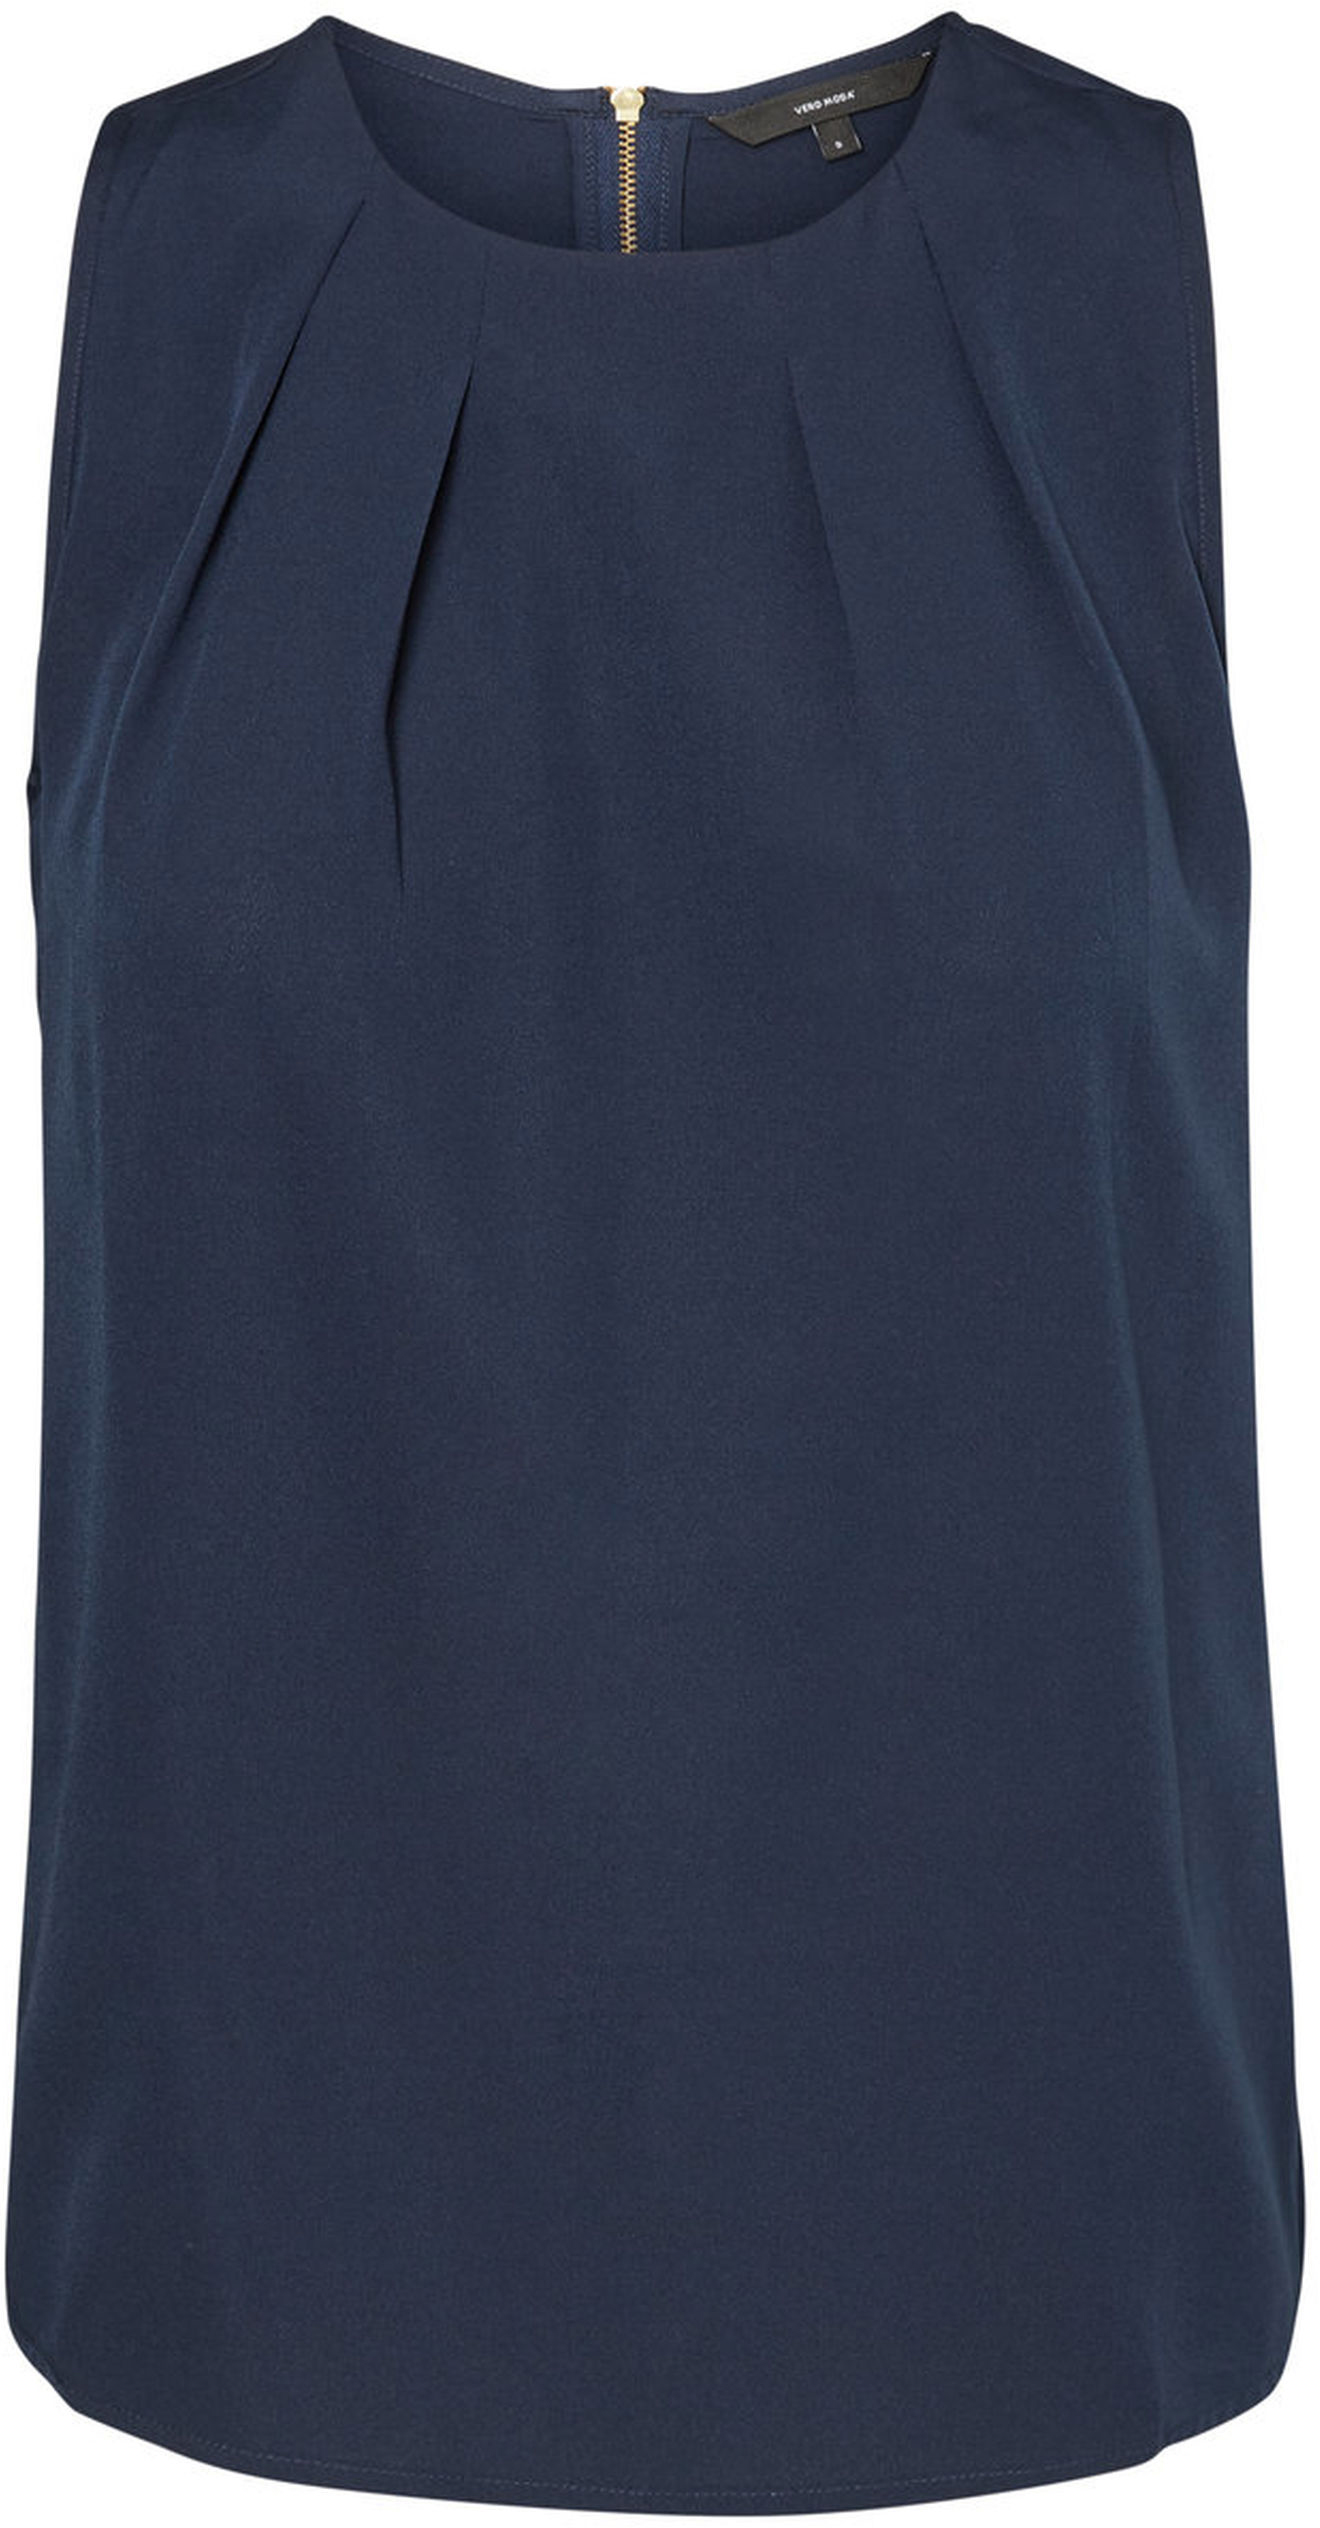 Топ жен Vero Moda, цвет: синий. 10185857_Navy Blazer. Размер XL (50/52)10185857_Navy Blazer